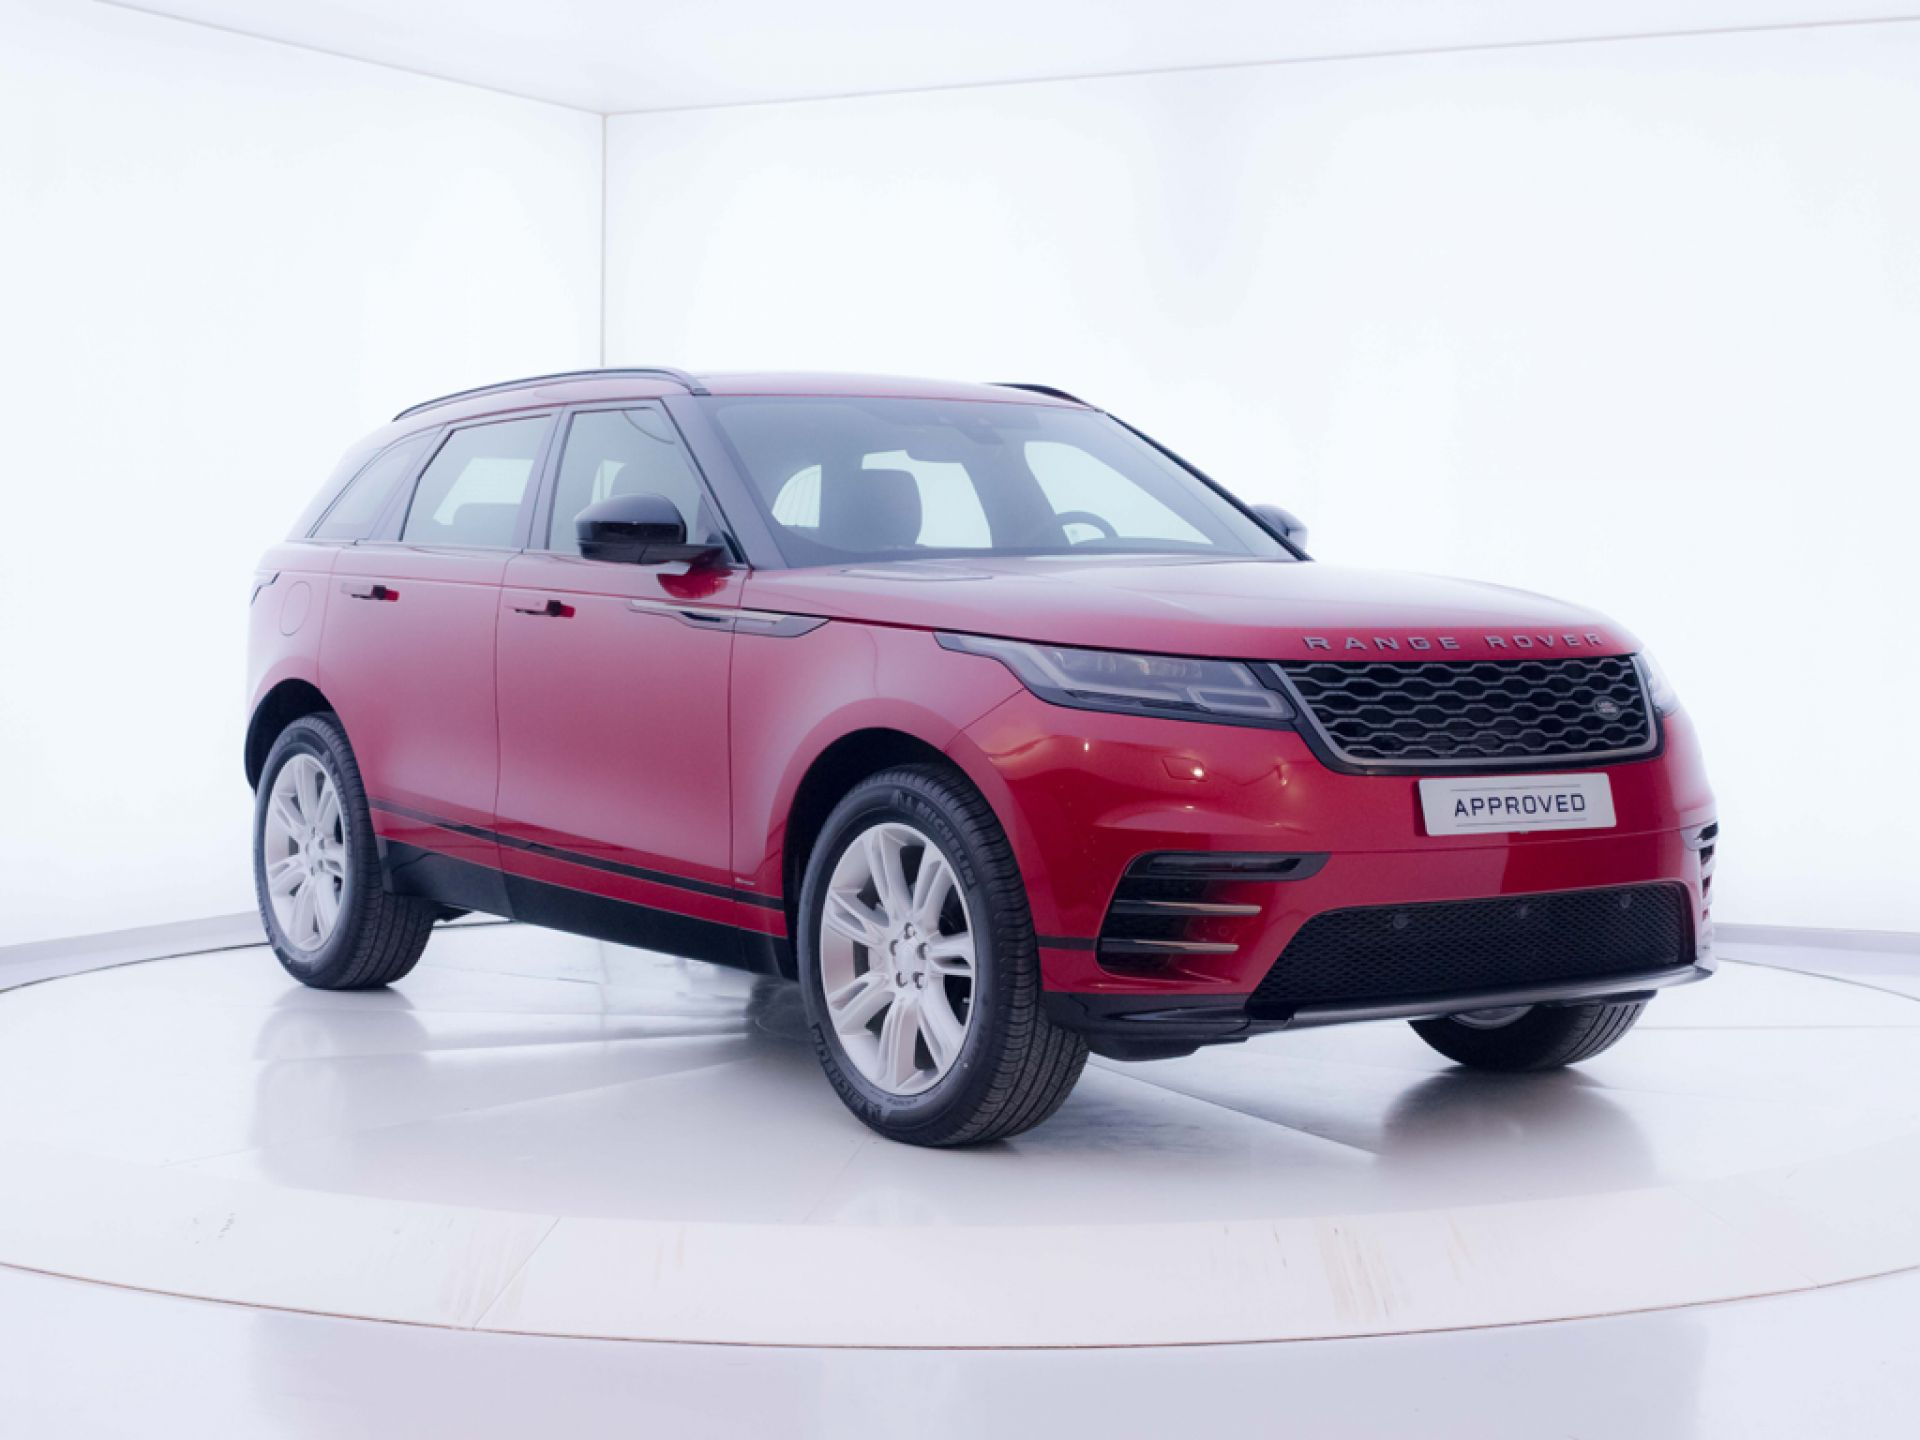 Land Rover Range Rover Velar 2.0 P250 R-Dynamic 4WD Auto